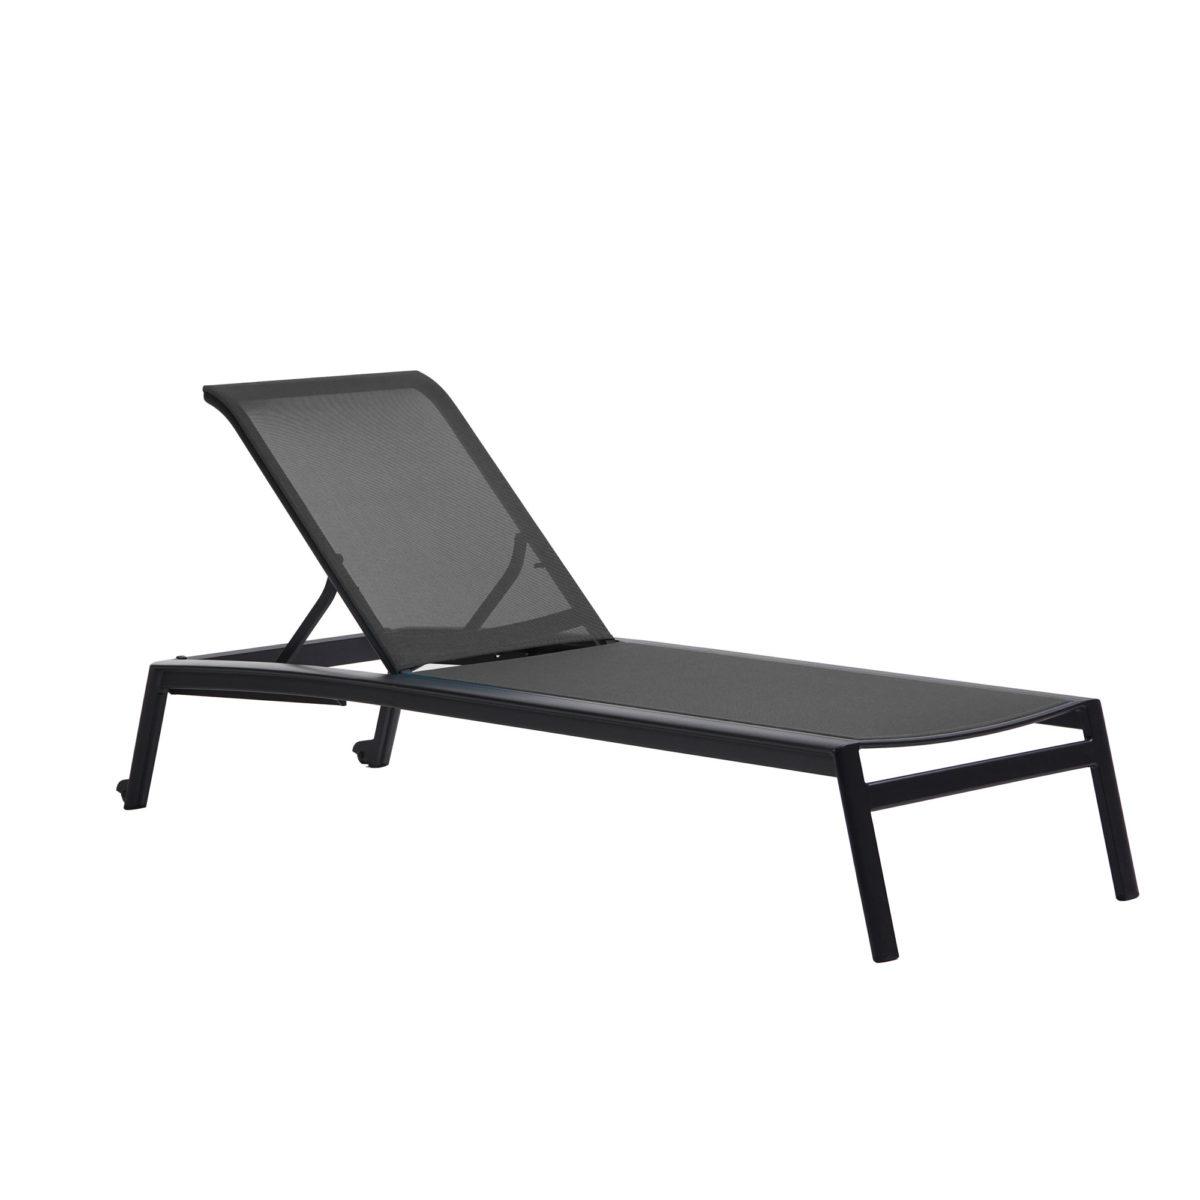 Lyon adjustable lounger in black.